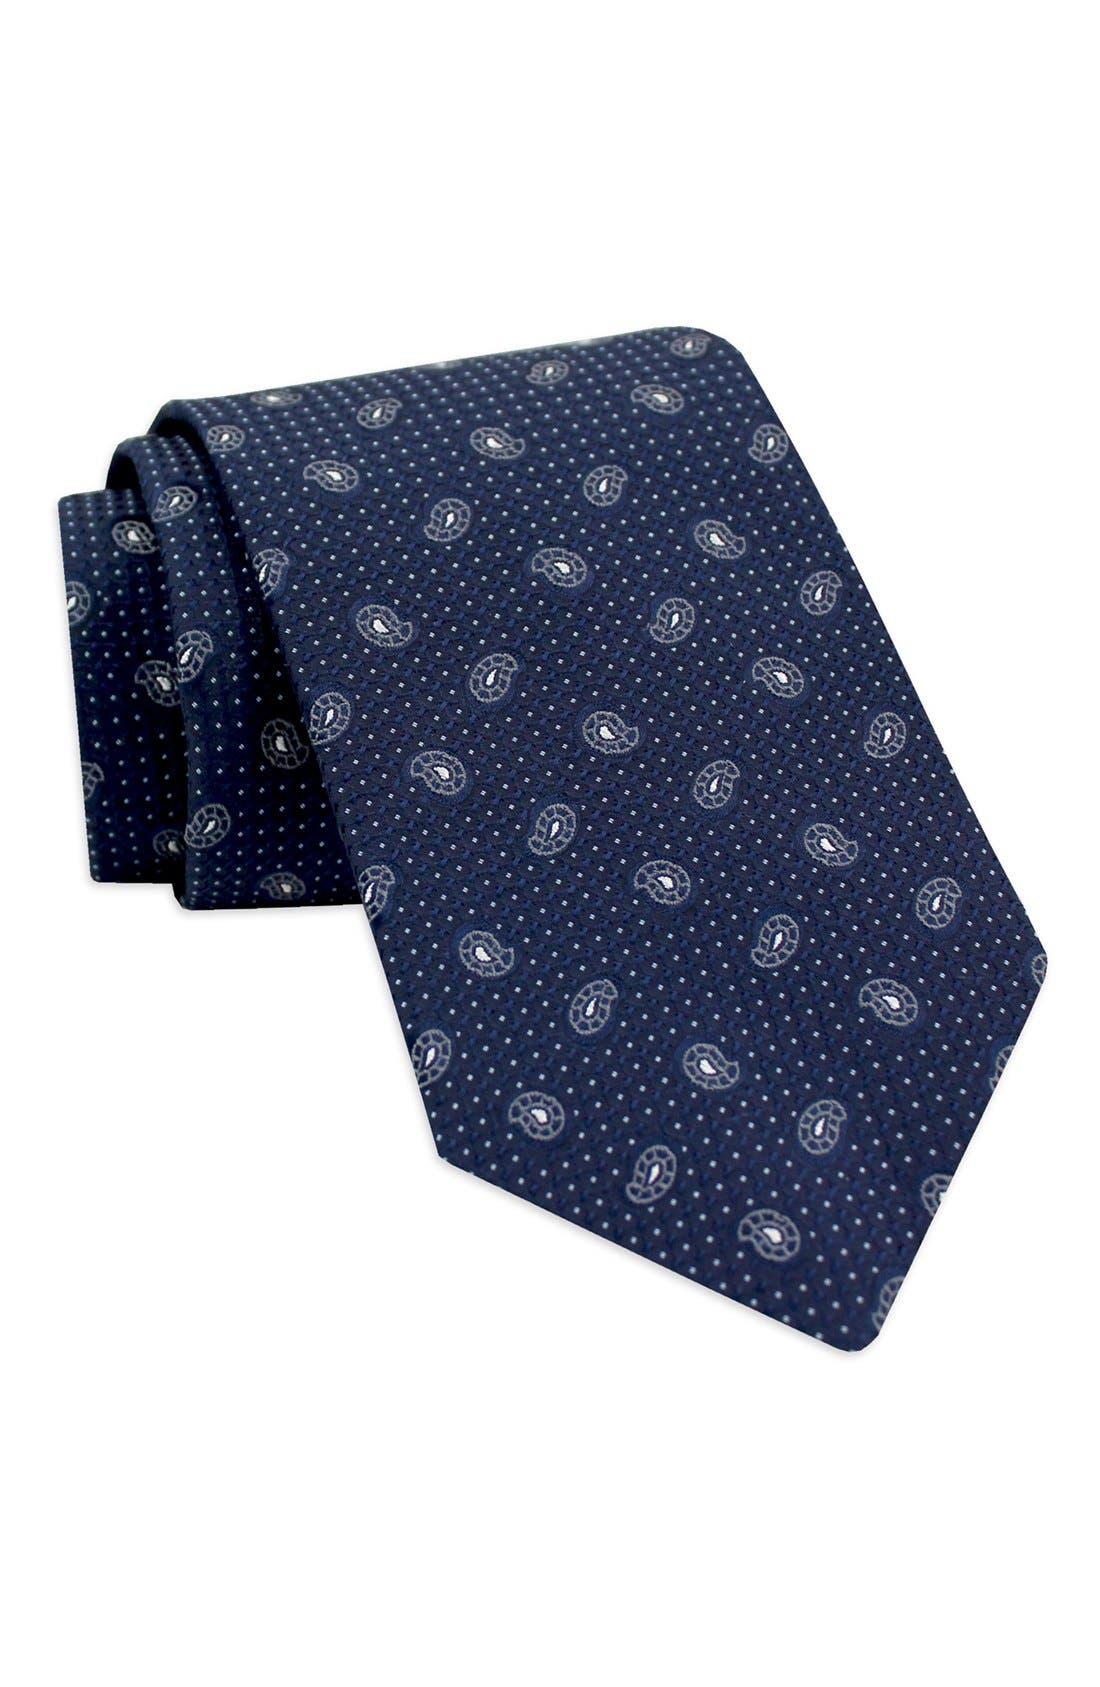 Alternate Image 1 Selected - Gitman Paisley Silk Tie (X-Long)